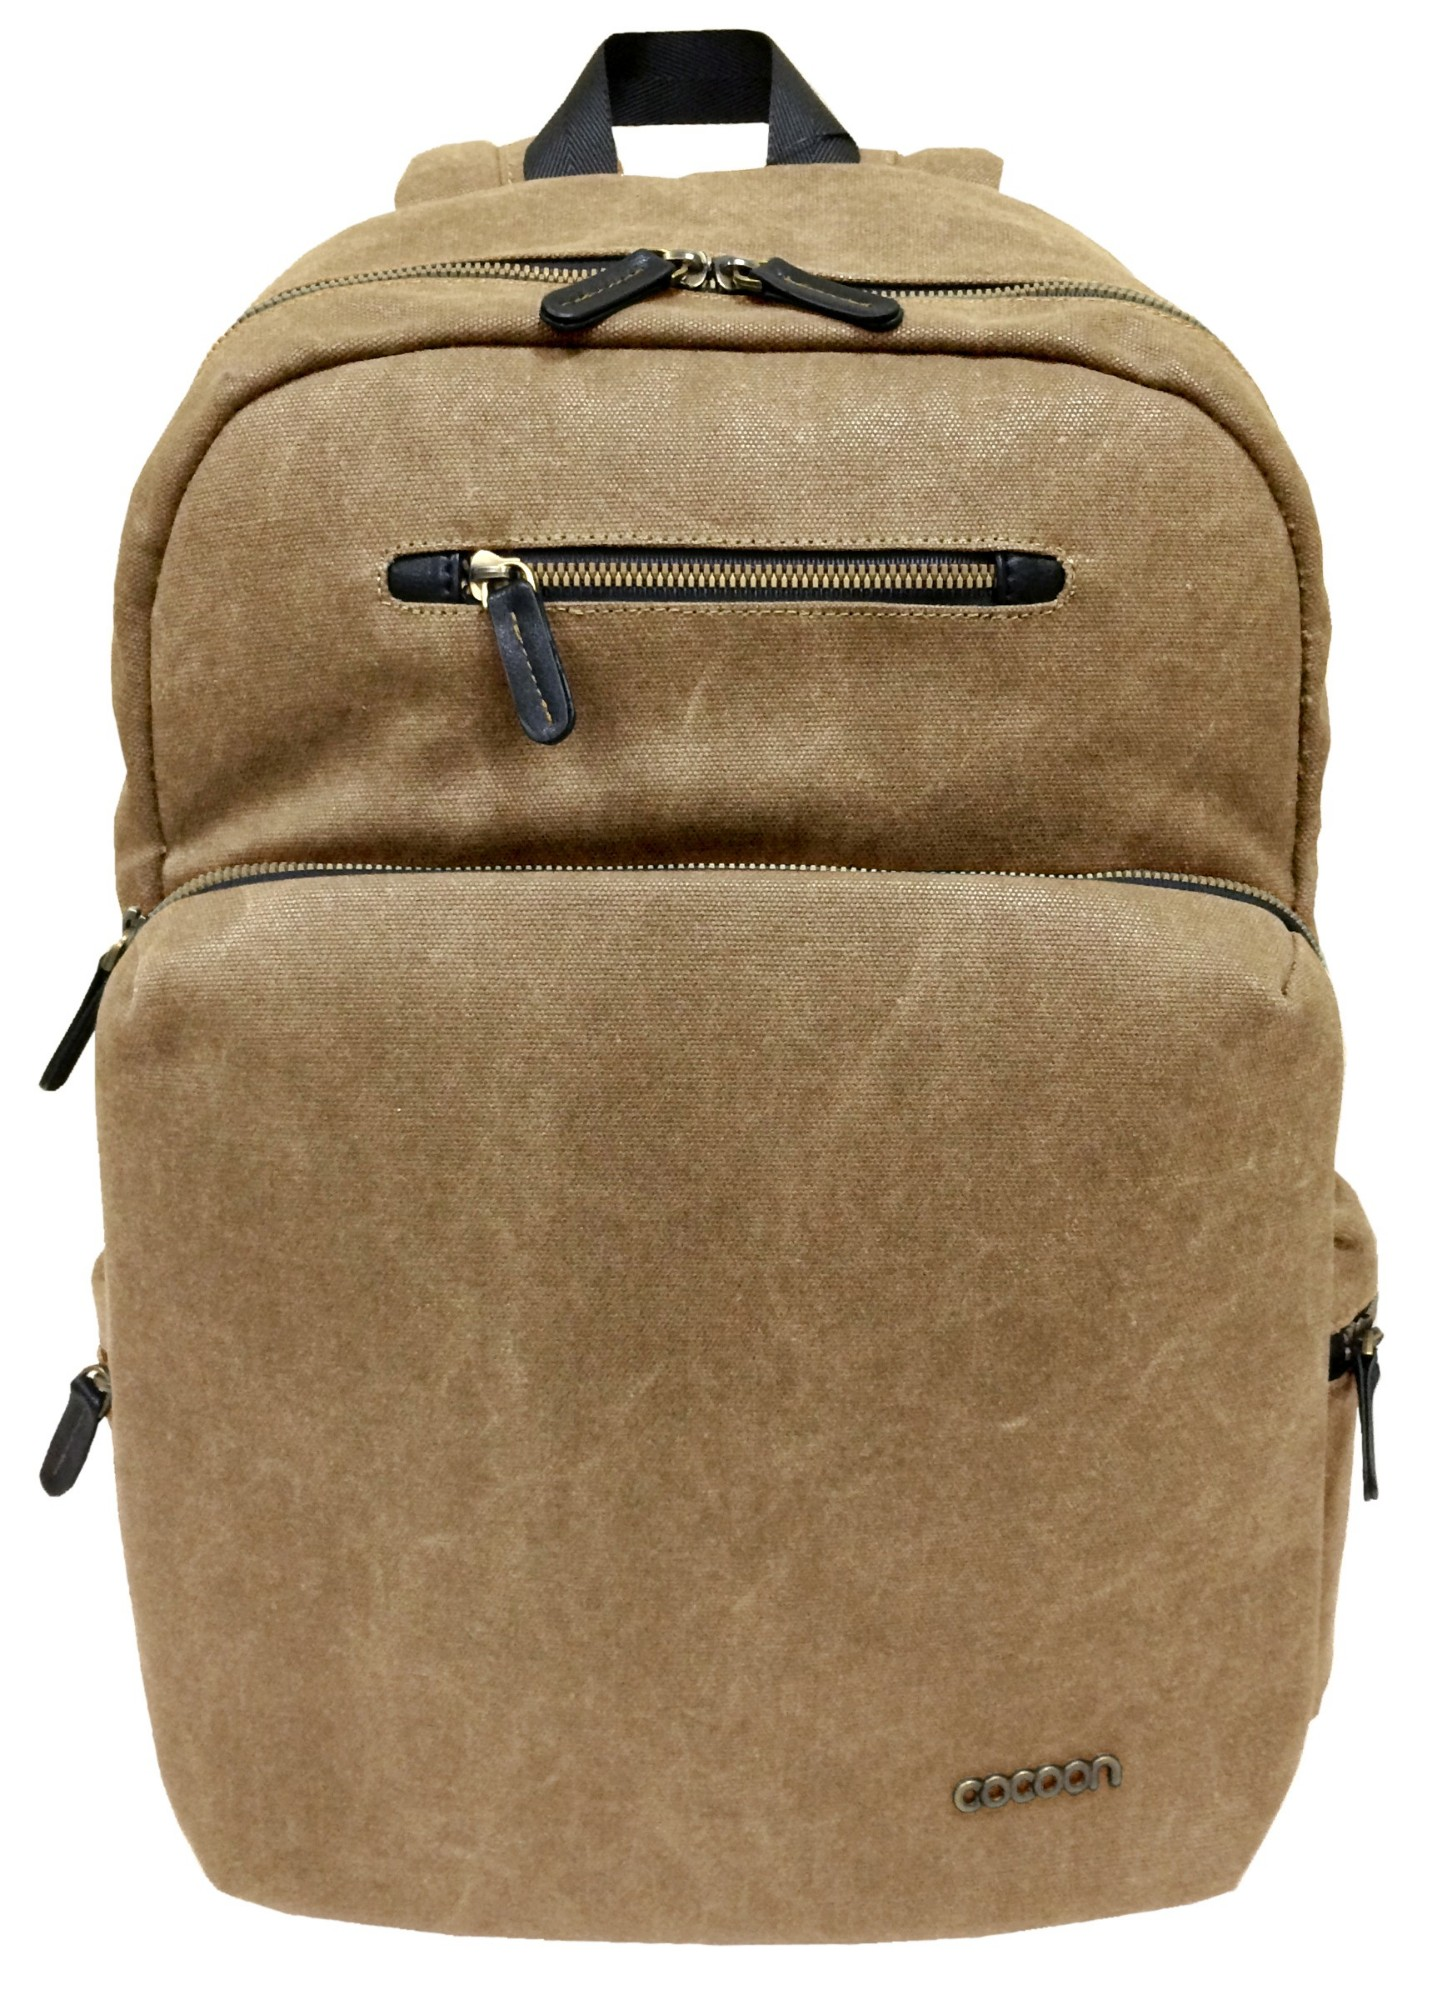 Cocoon Urban Adventure 16 Backpack - Ki